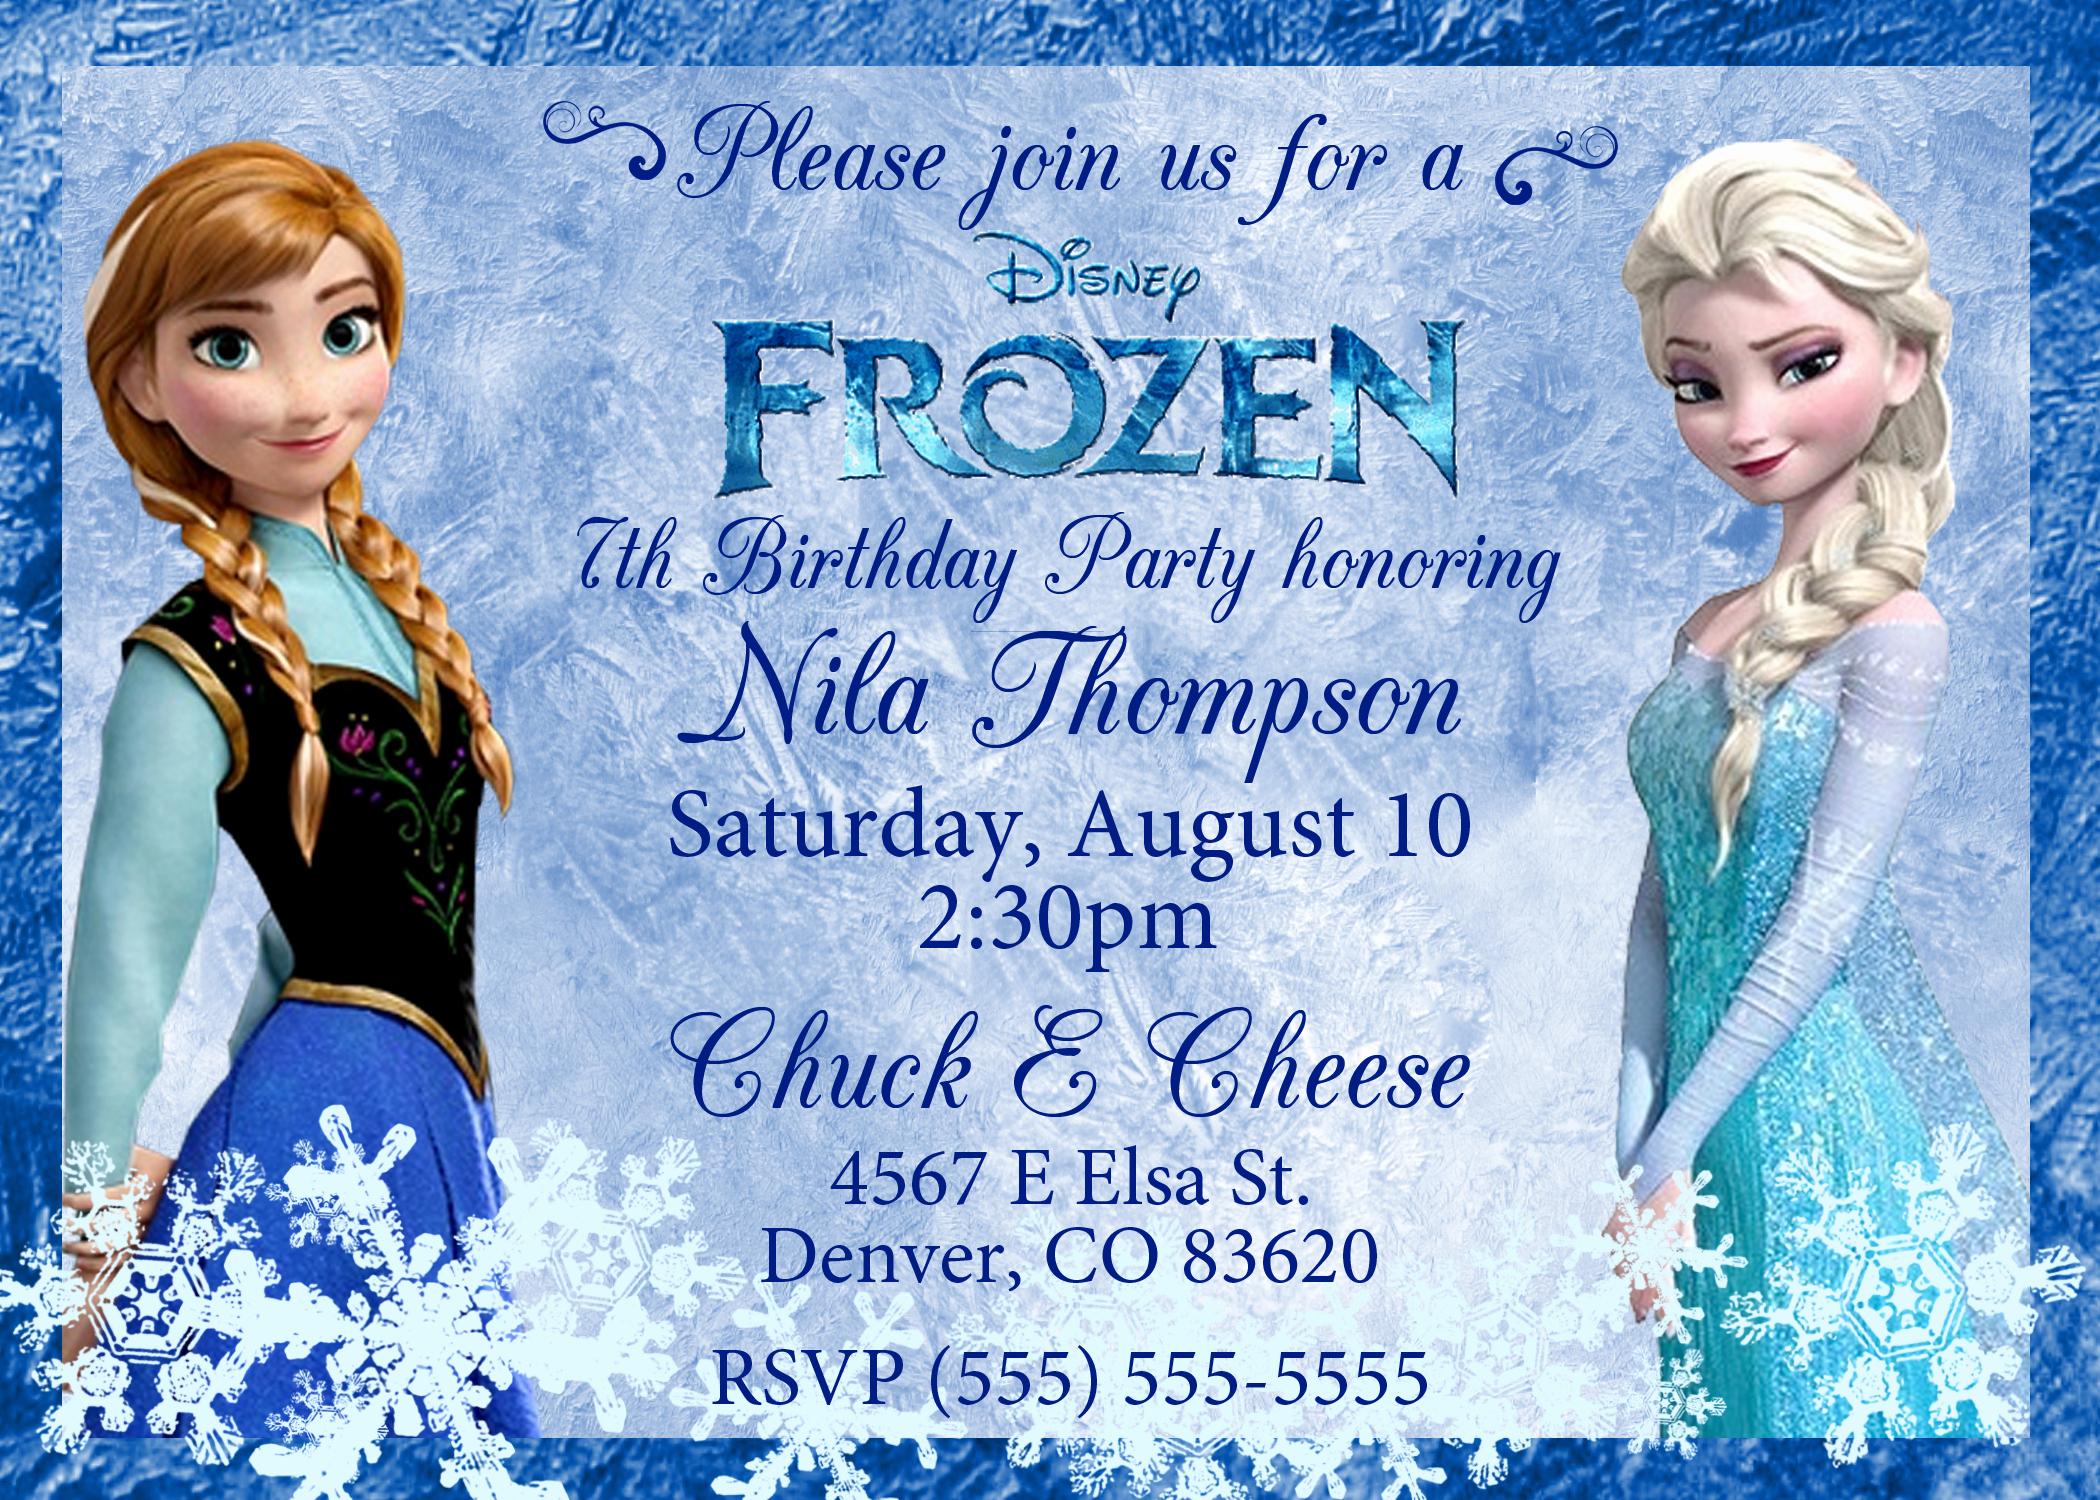 Frozen Invitation Template Free Lovely Frozen 2013 Birthday Invitation